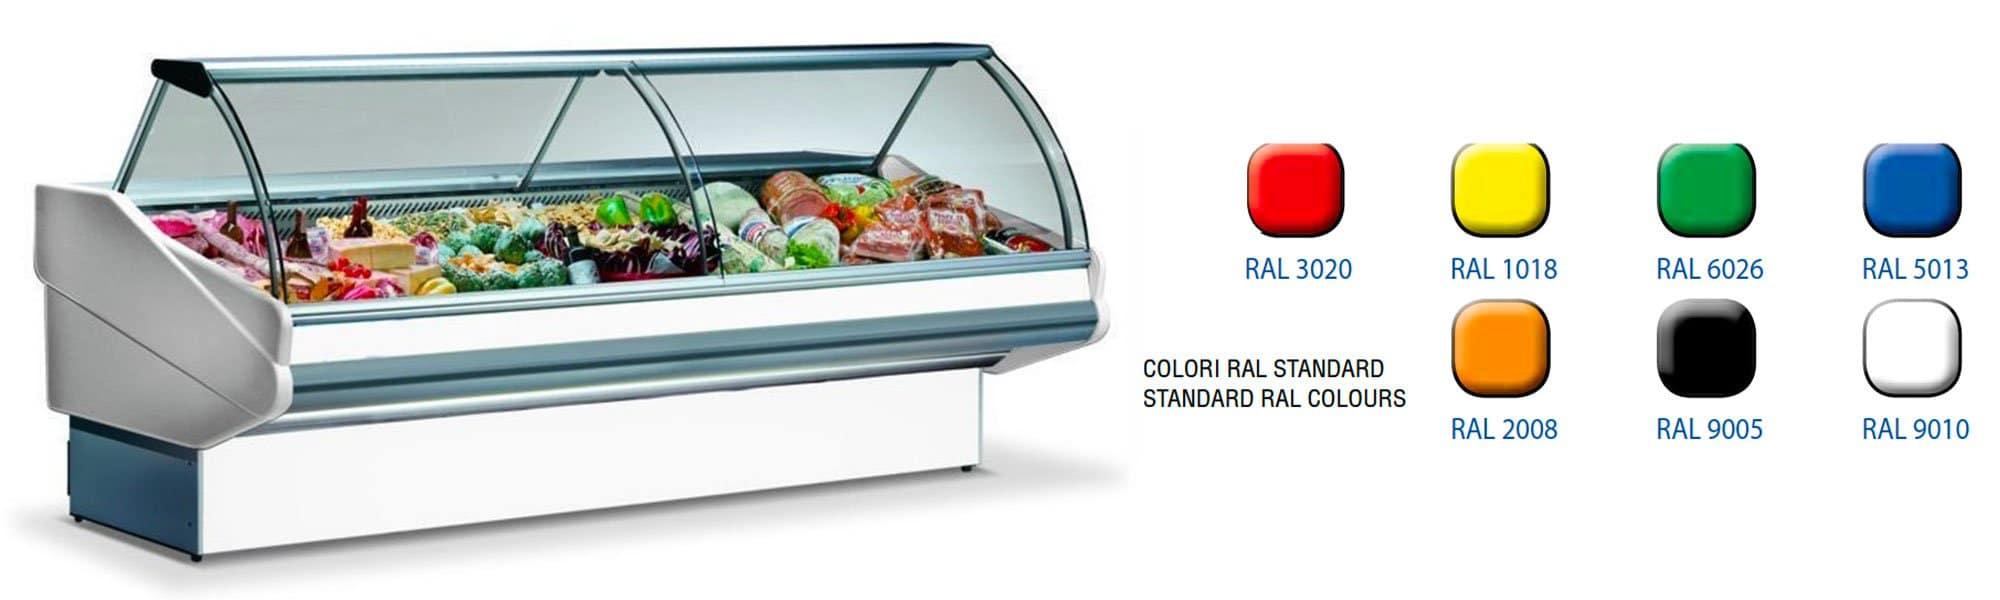 Display refrigerators for fresh fresh pasta and gastronomy